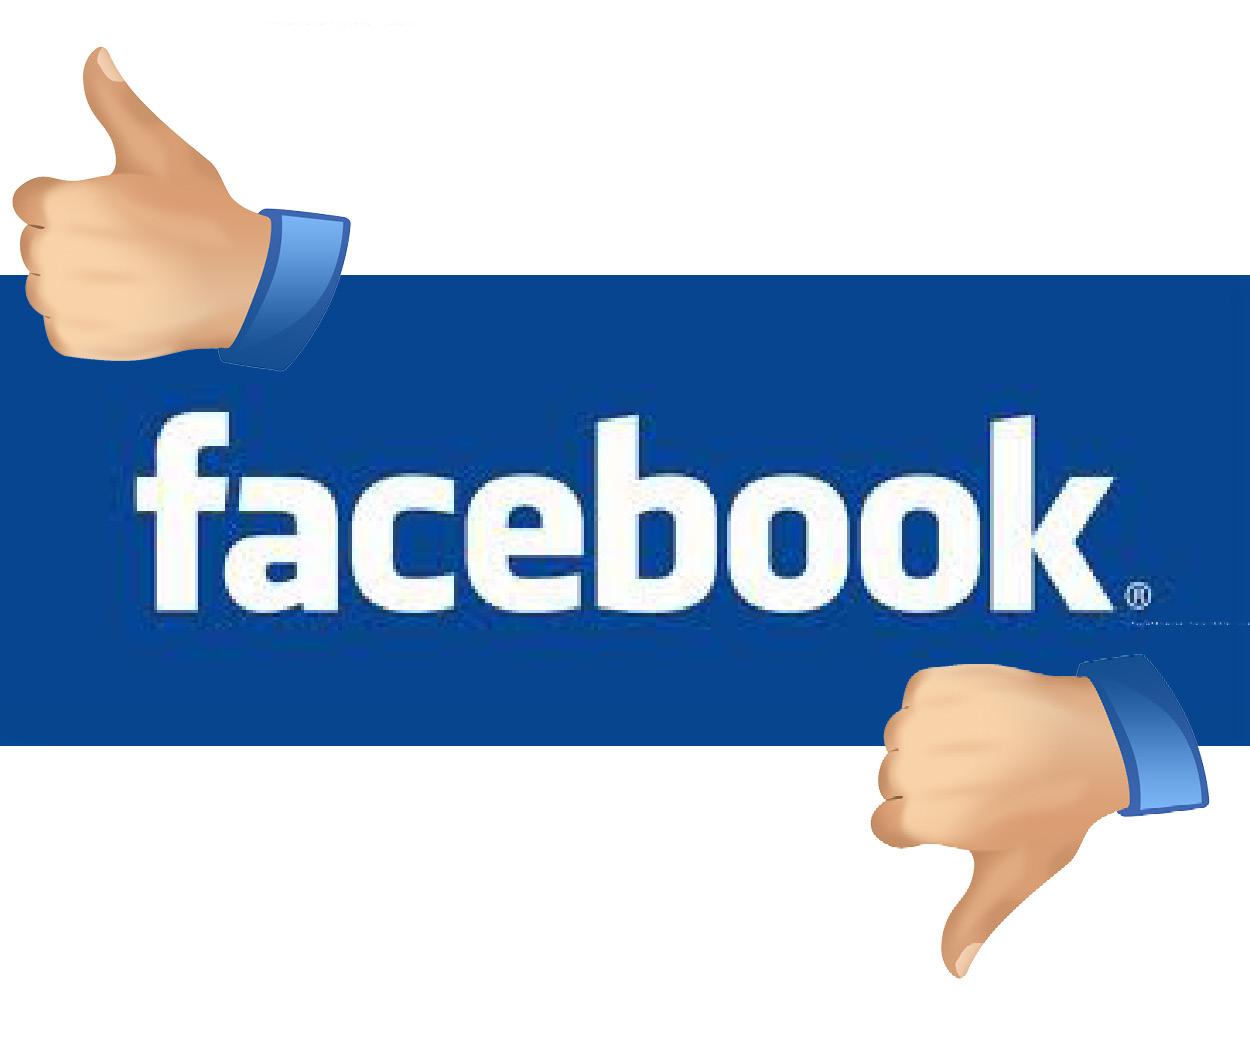 Testeandosoftware.com en Facebook